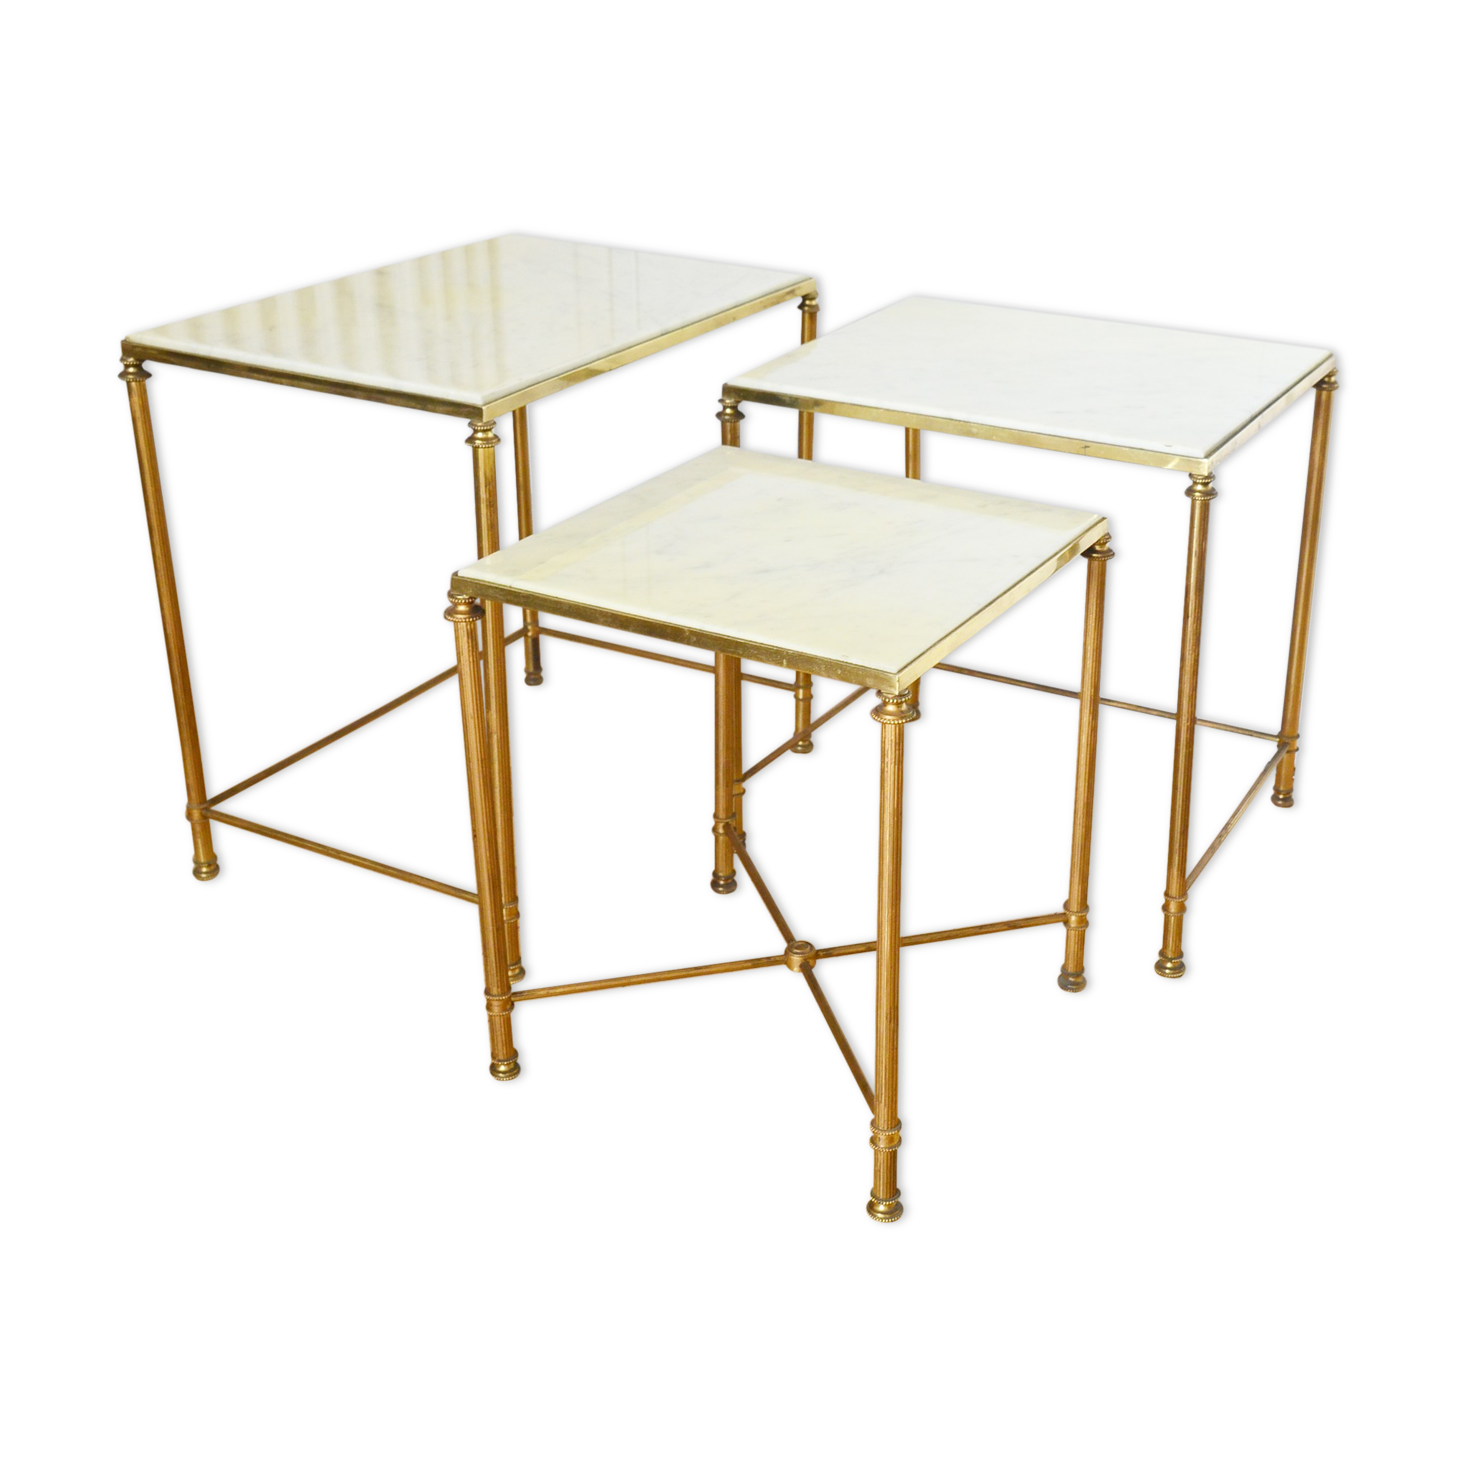 tables gigognes blanches lot tables gigognes marbre blanc annes with tables gigognes blanches. Black Bedroom Furniture Sets. Home Design Ideas